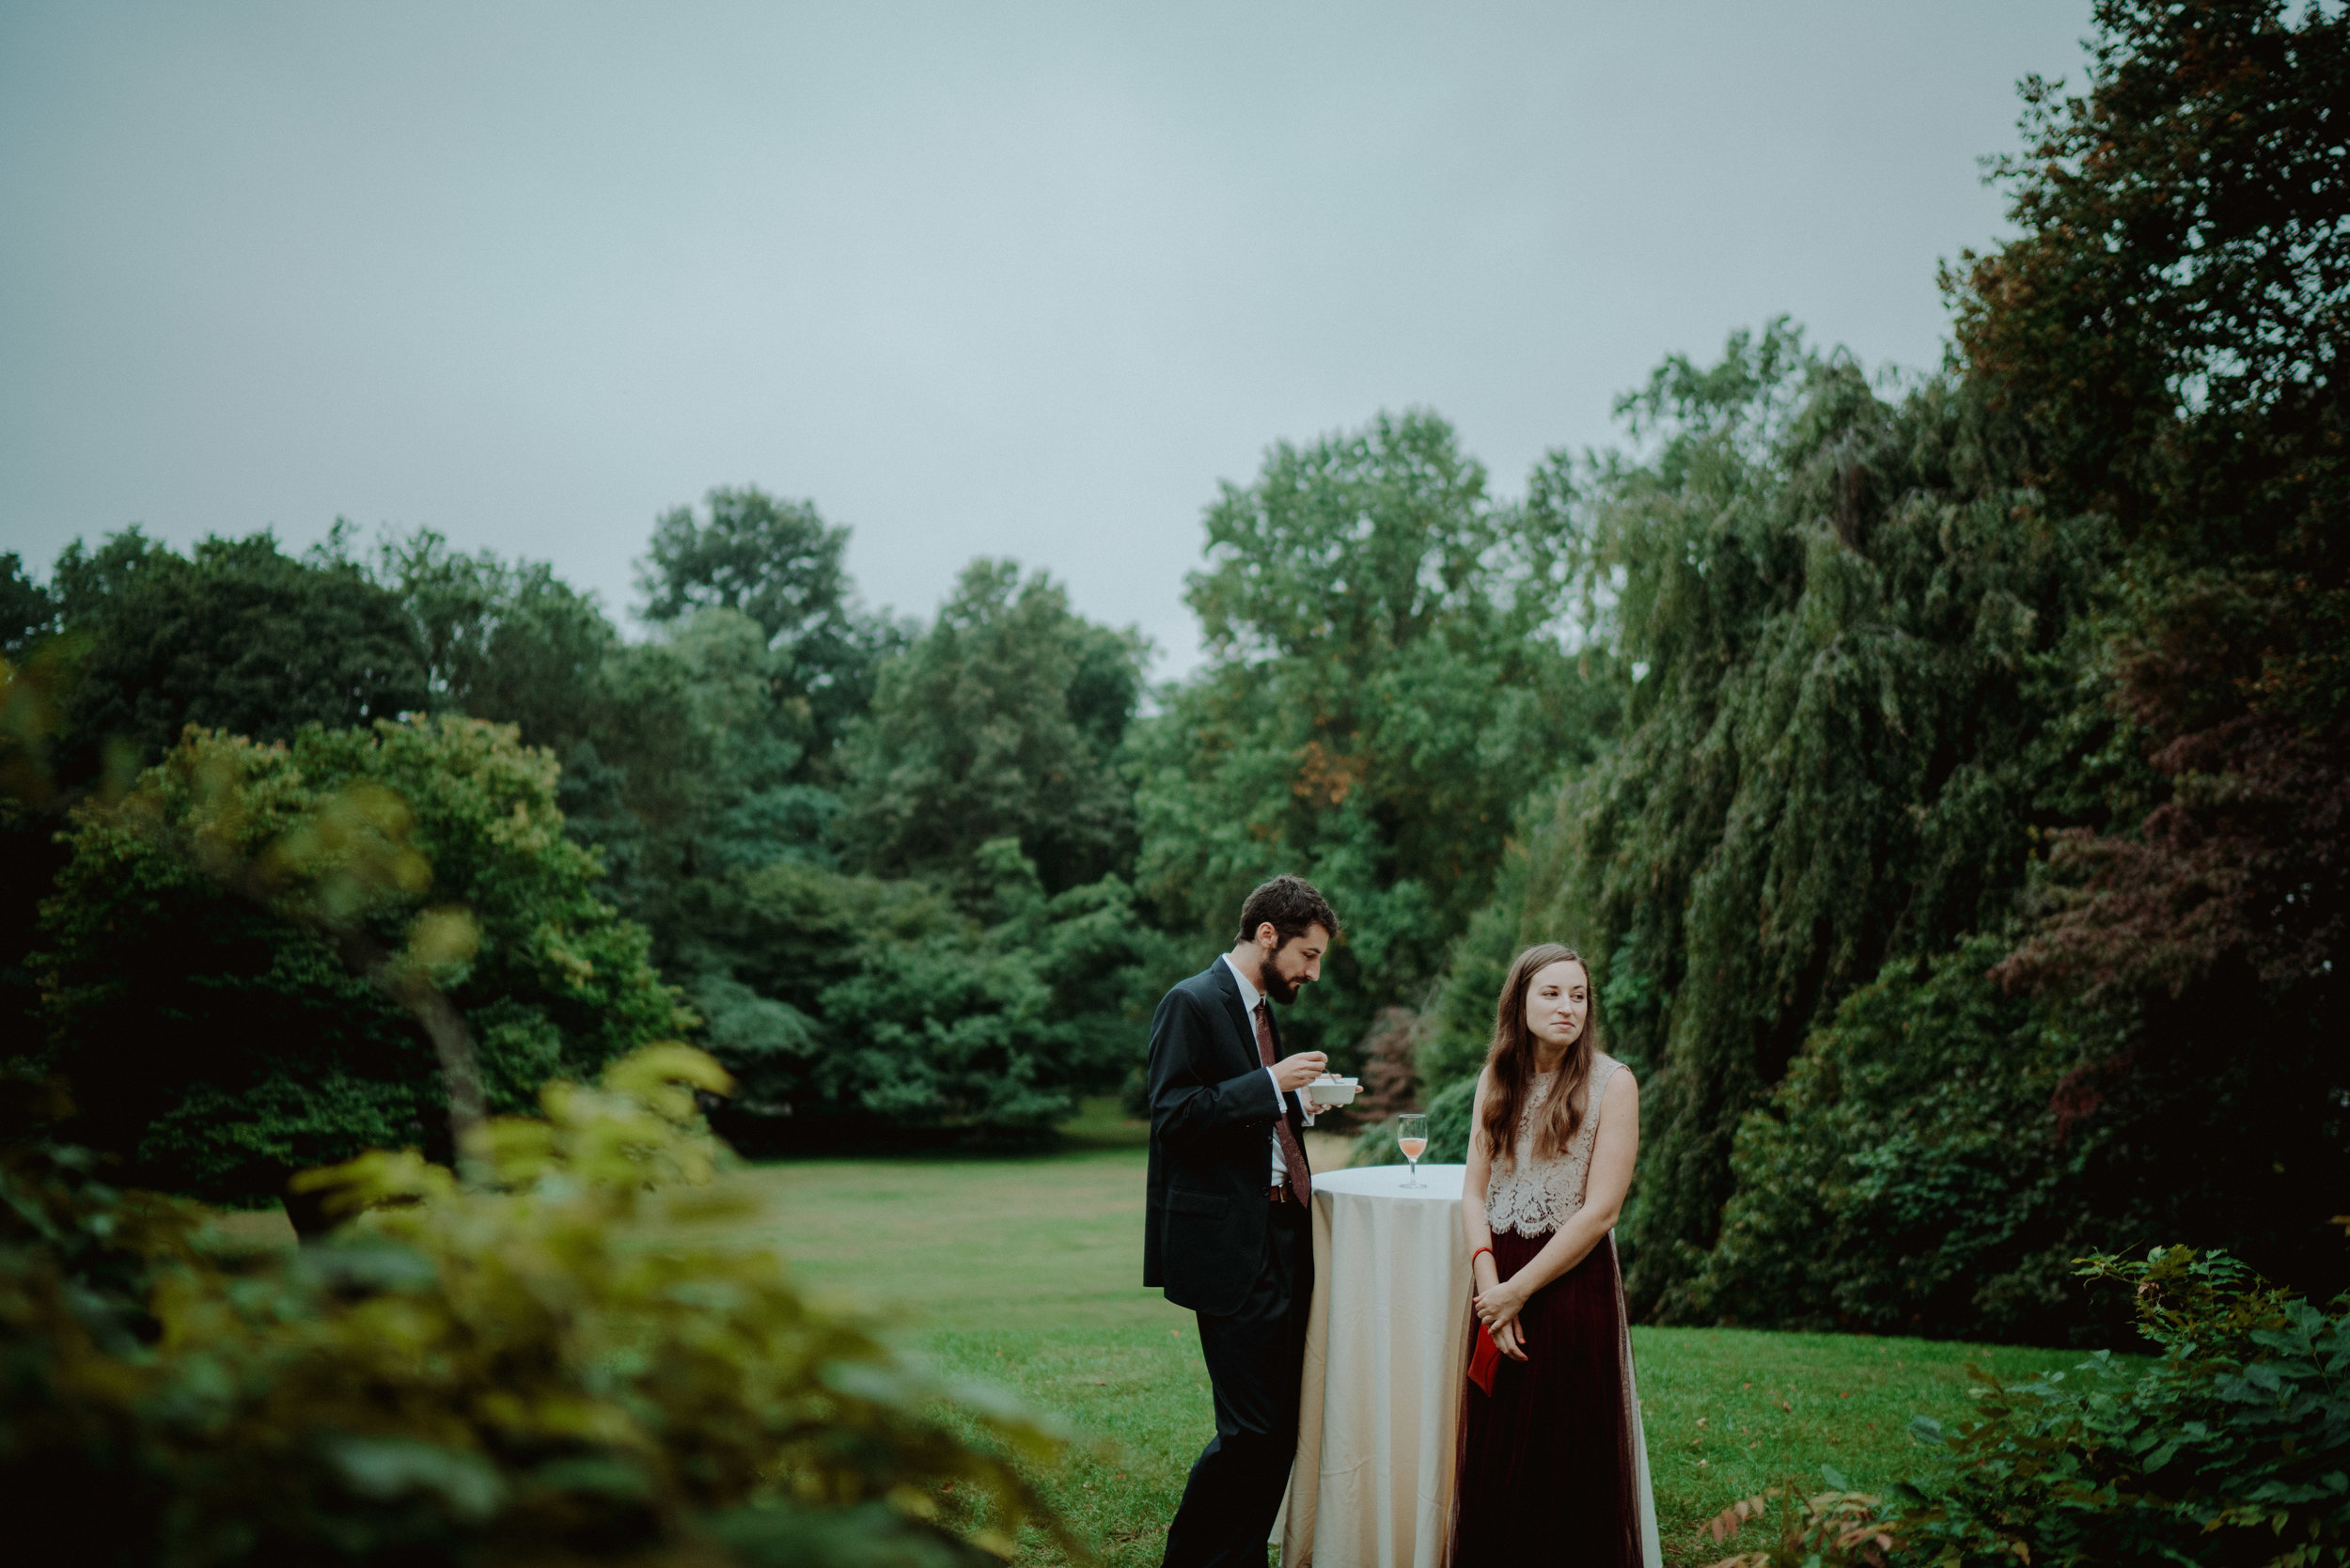 Irene-and-Jae-2019_Brooklyn_Wedding_Photographer_Chellise_Michael_Photography--73.jpg